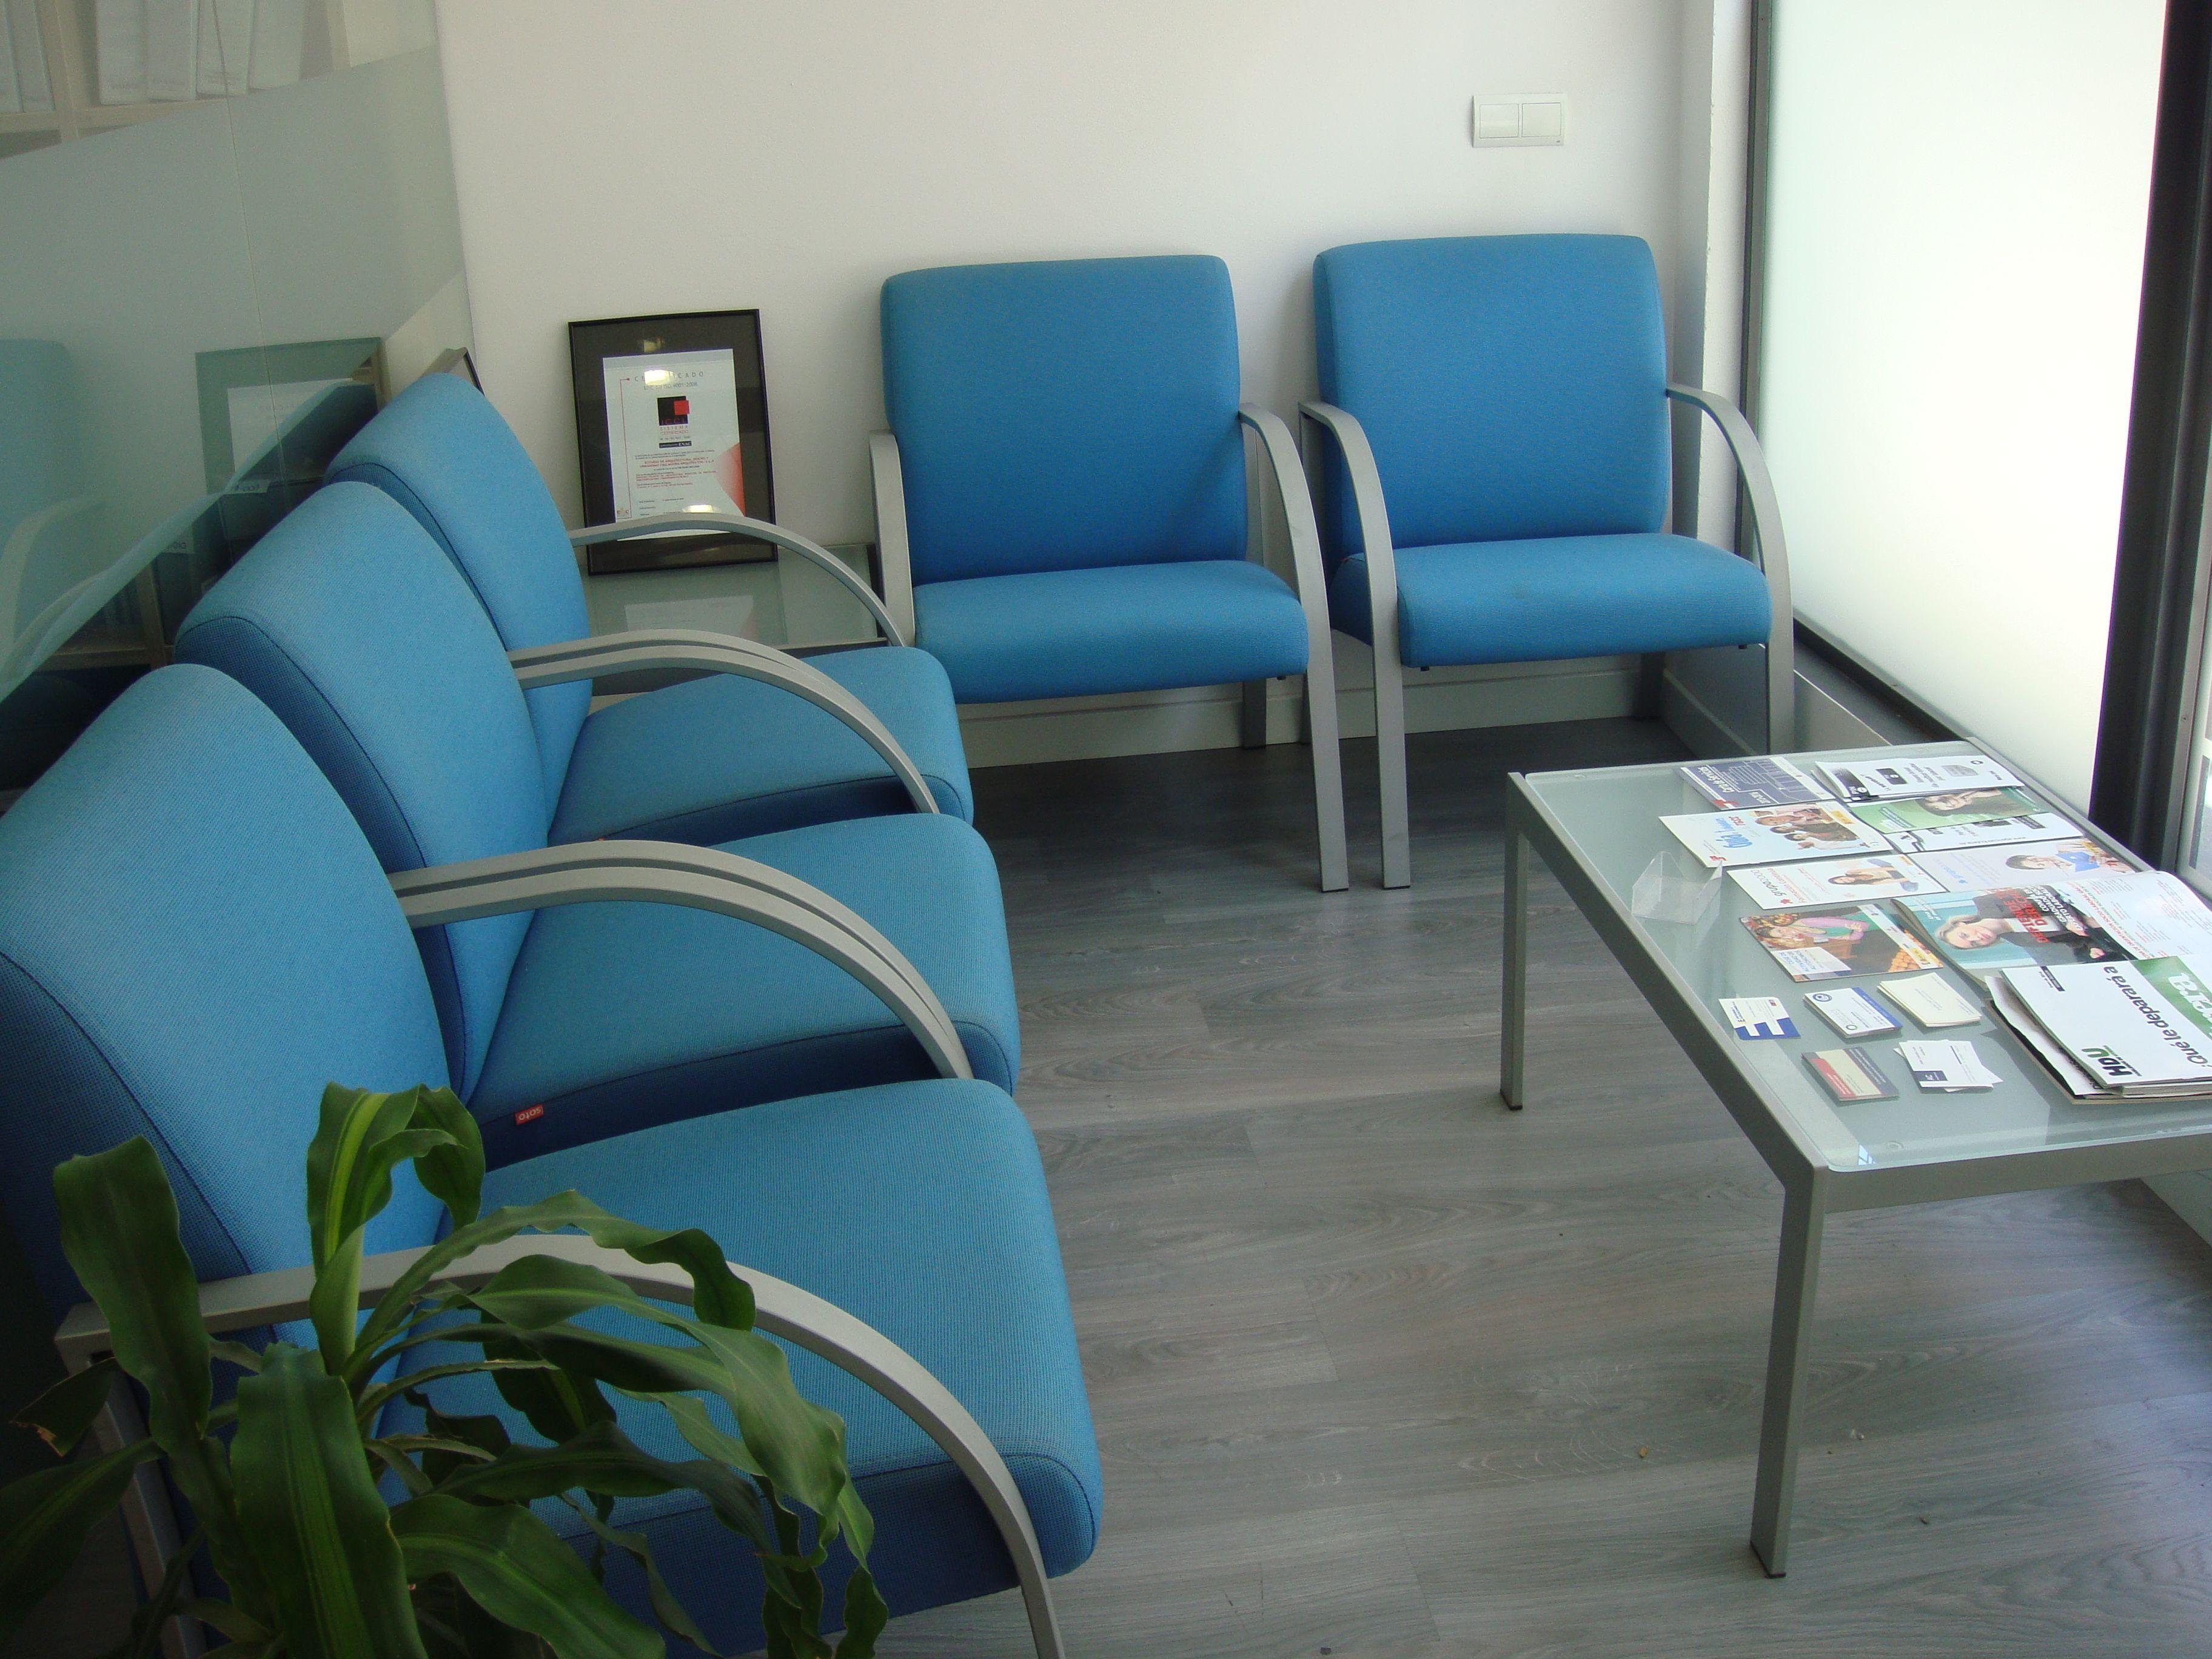 Sala de espera ac arq coworking utrera pinterest for Silla odontologica